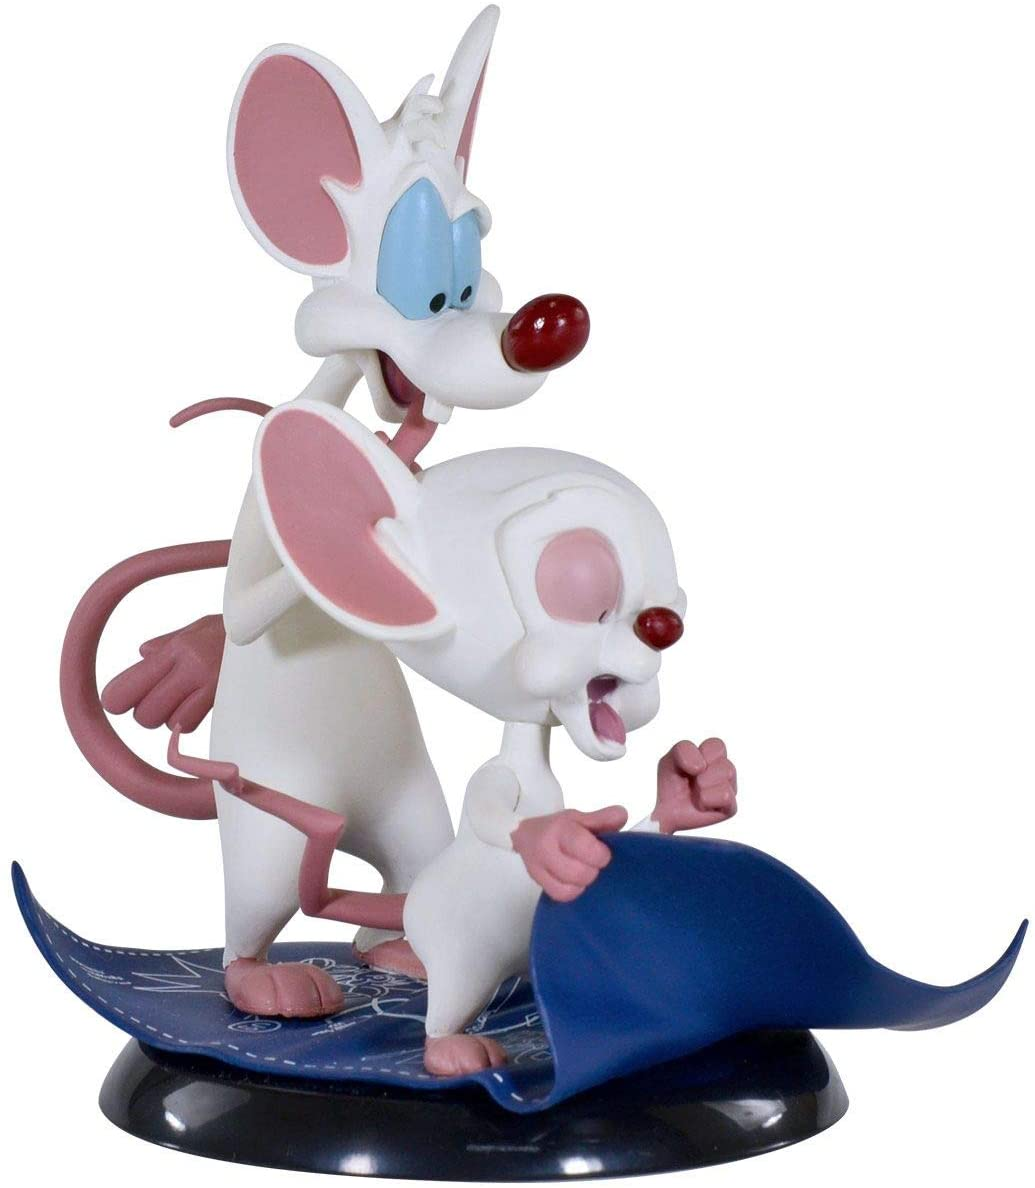 Pinky and The Brain (Pink e o Cérebro) - Q-Fig - Quantum Mechanix